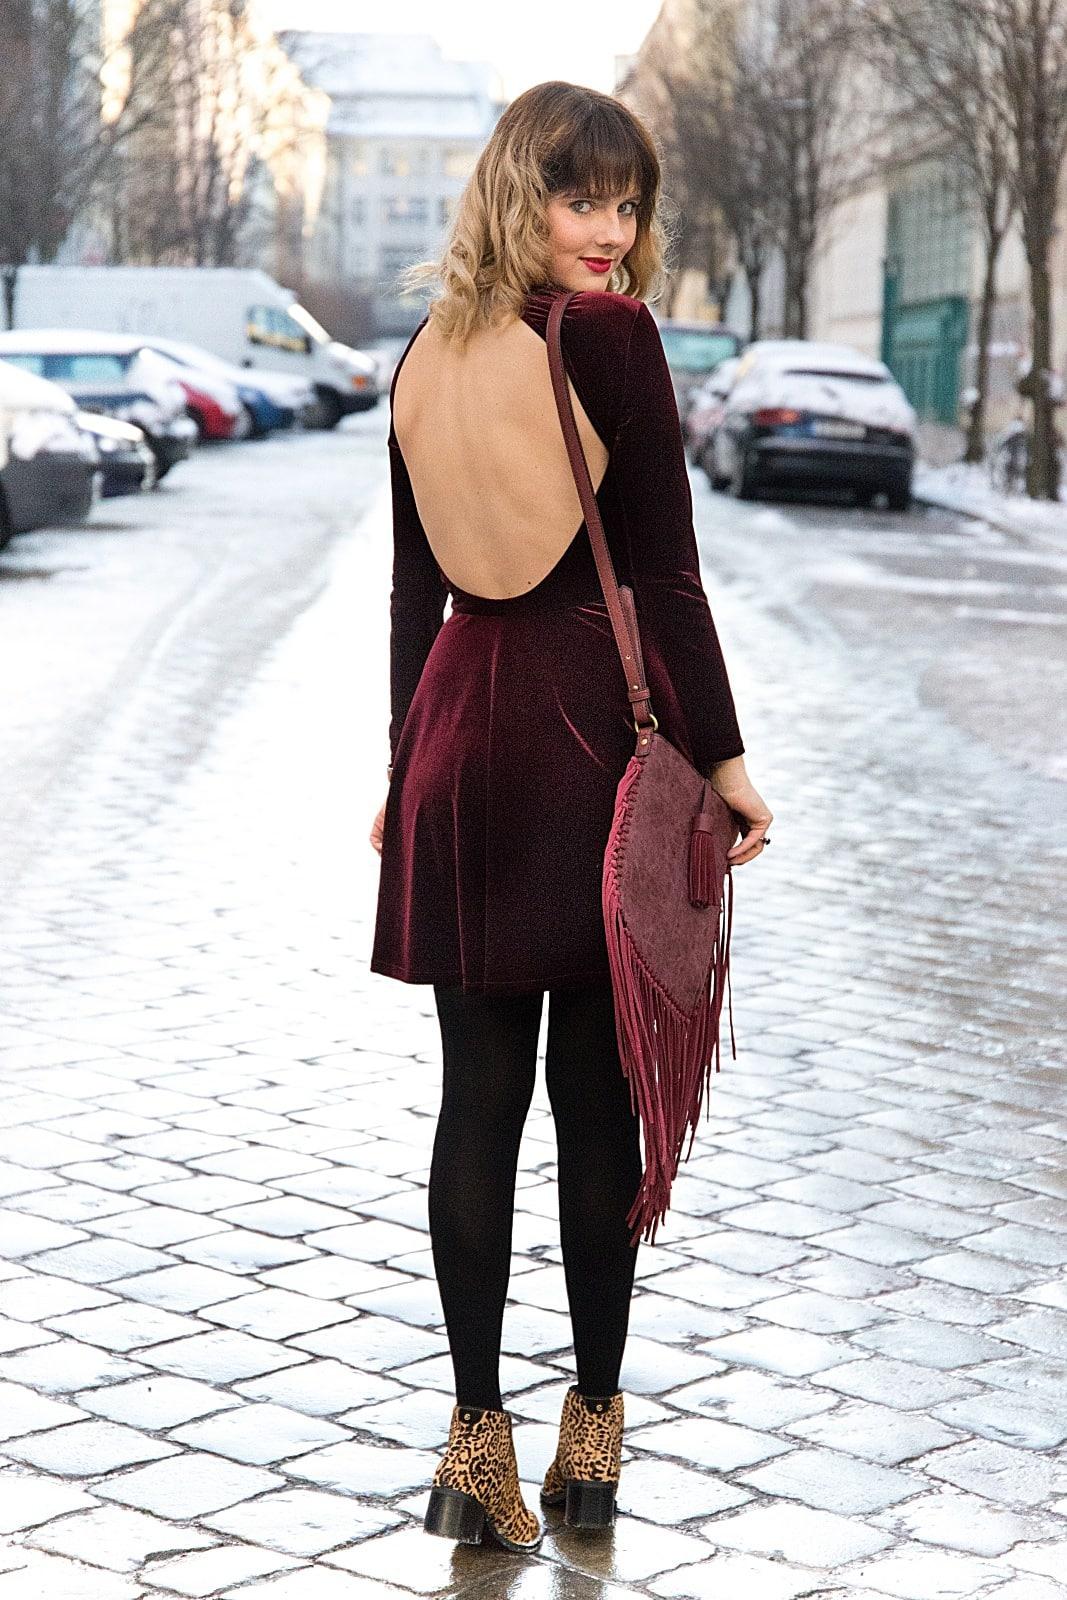 desbelleschoses-fashion-blog-köln-deutschland-berlin-fashion-week-januar-2016-streetstyle-tag-2-samtkleid-leo-boots 7